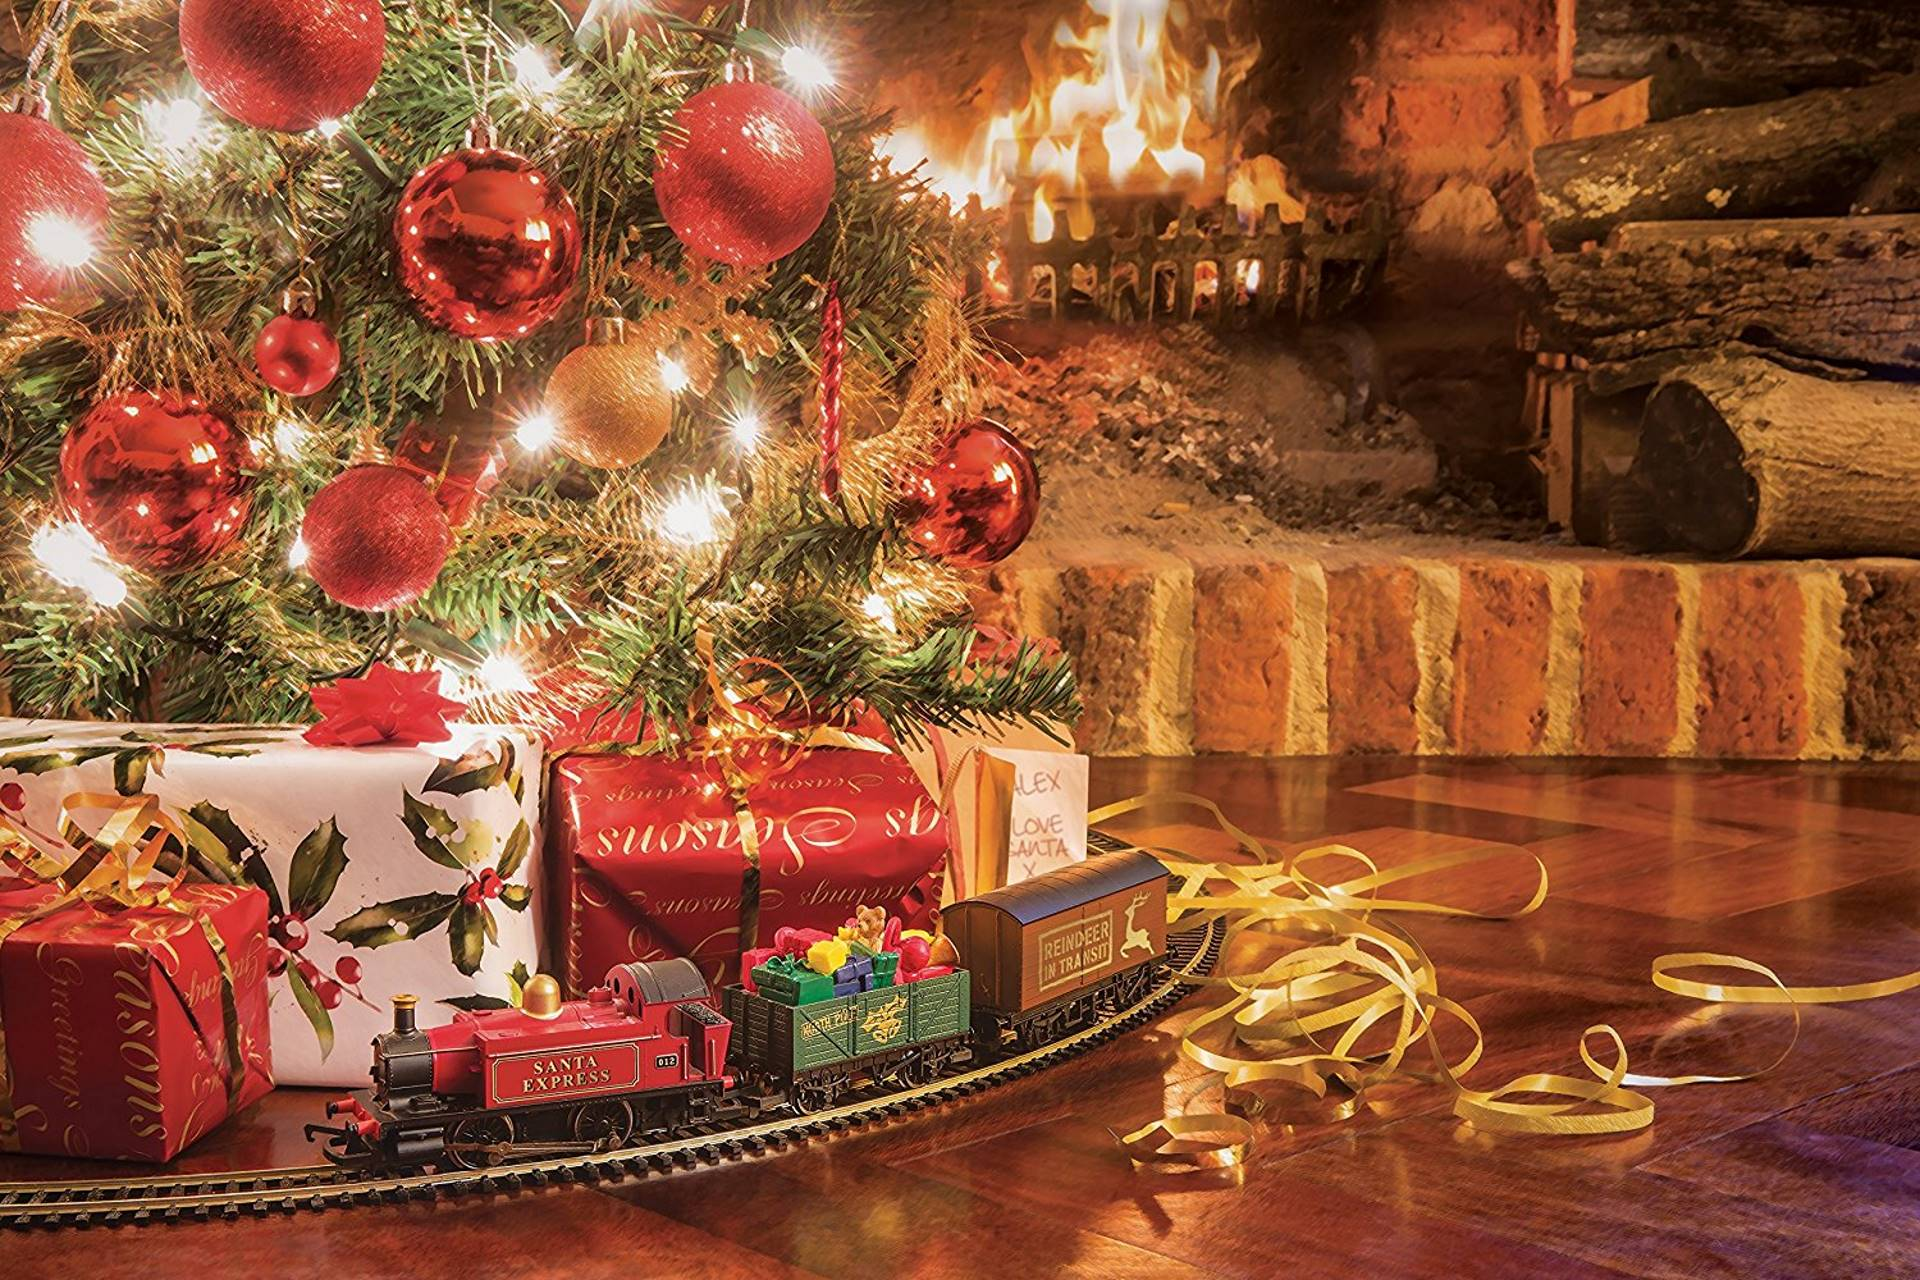 Hornby Santas Express Christmas Train Set